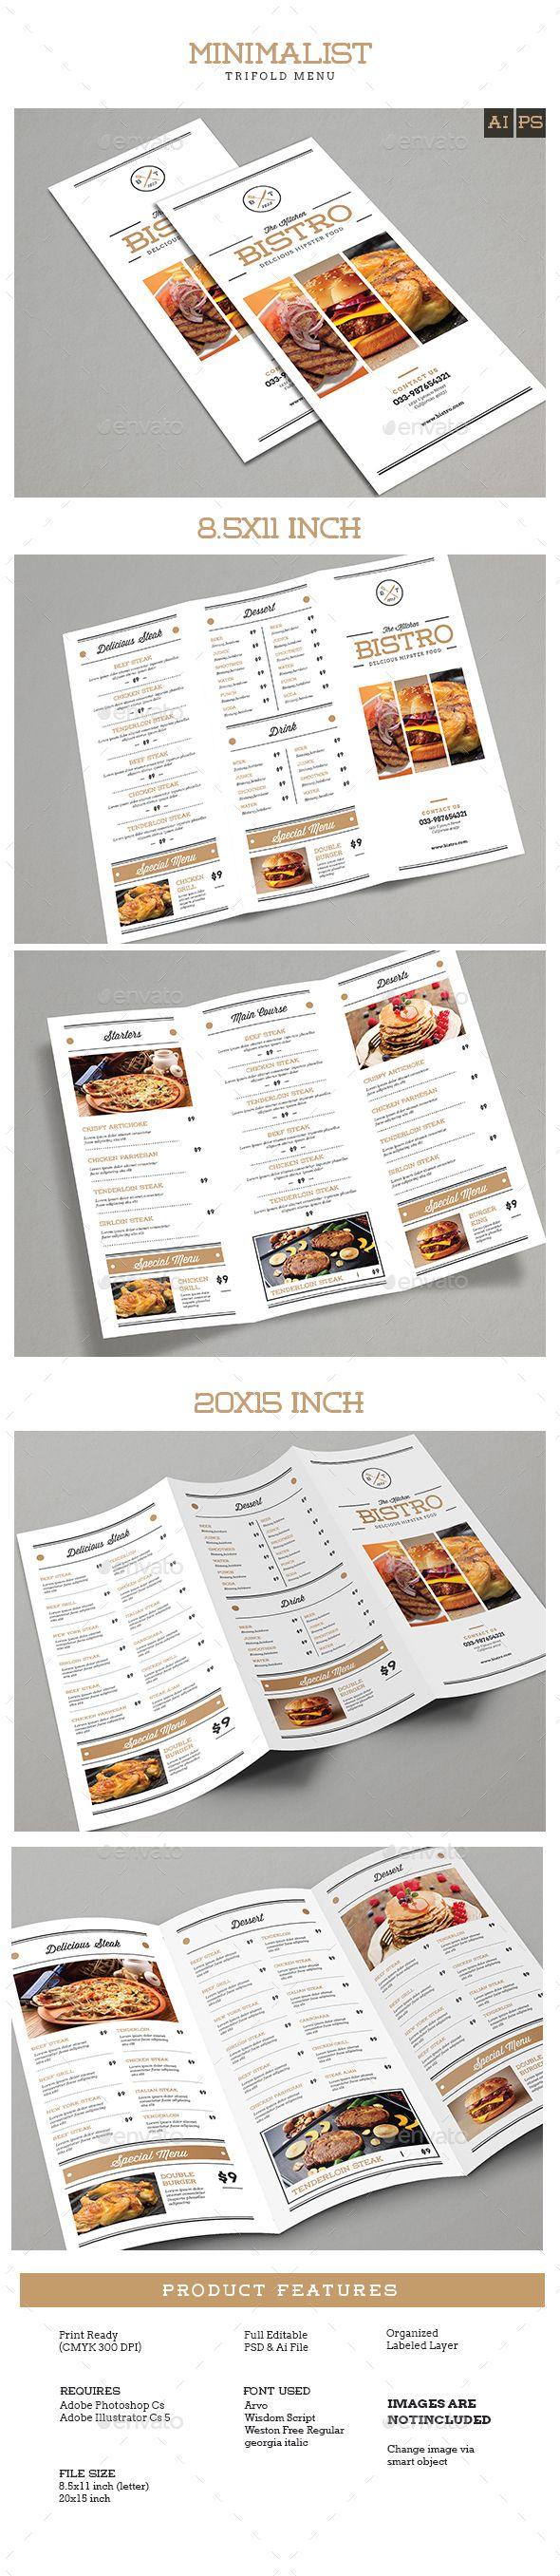 Best 25 Free menu templates ideas – Free Printable Restaurant Menus